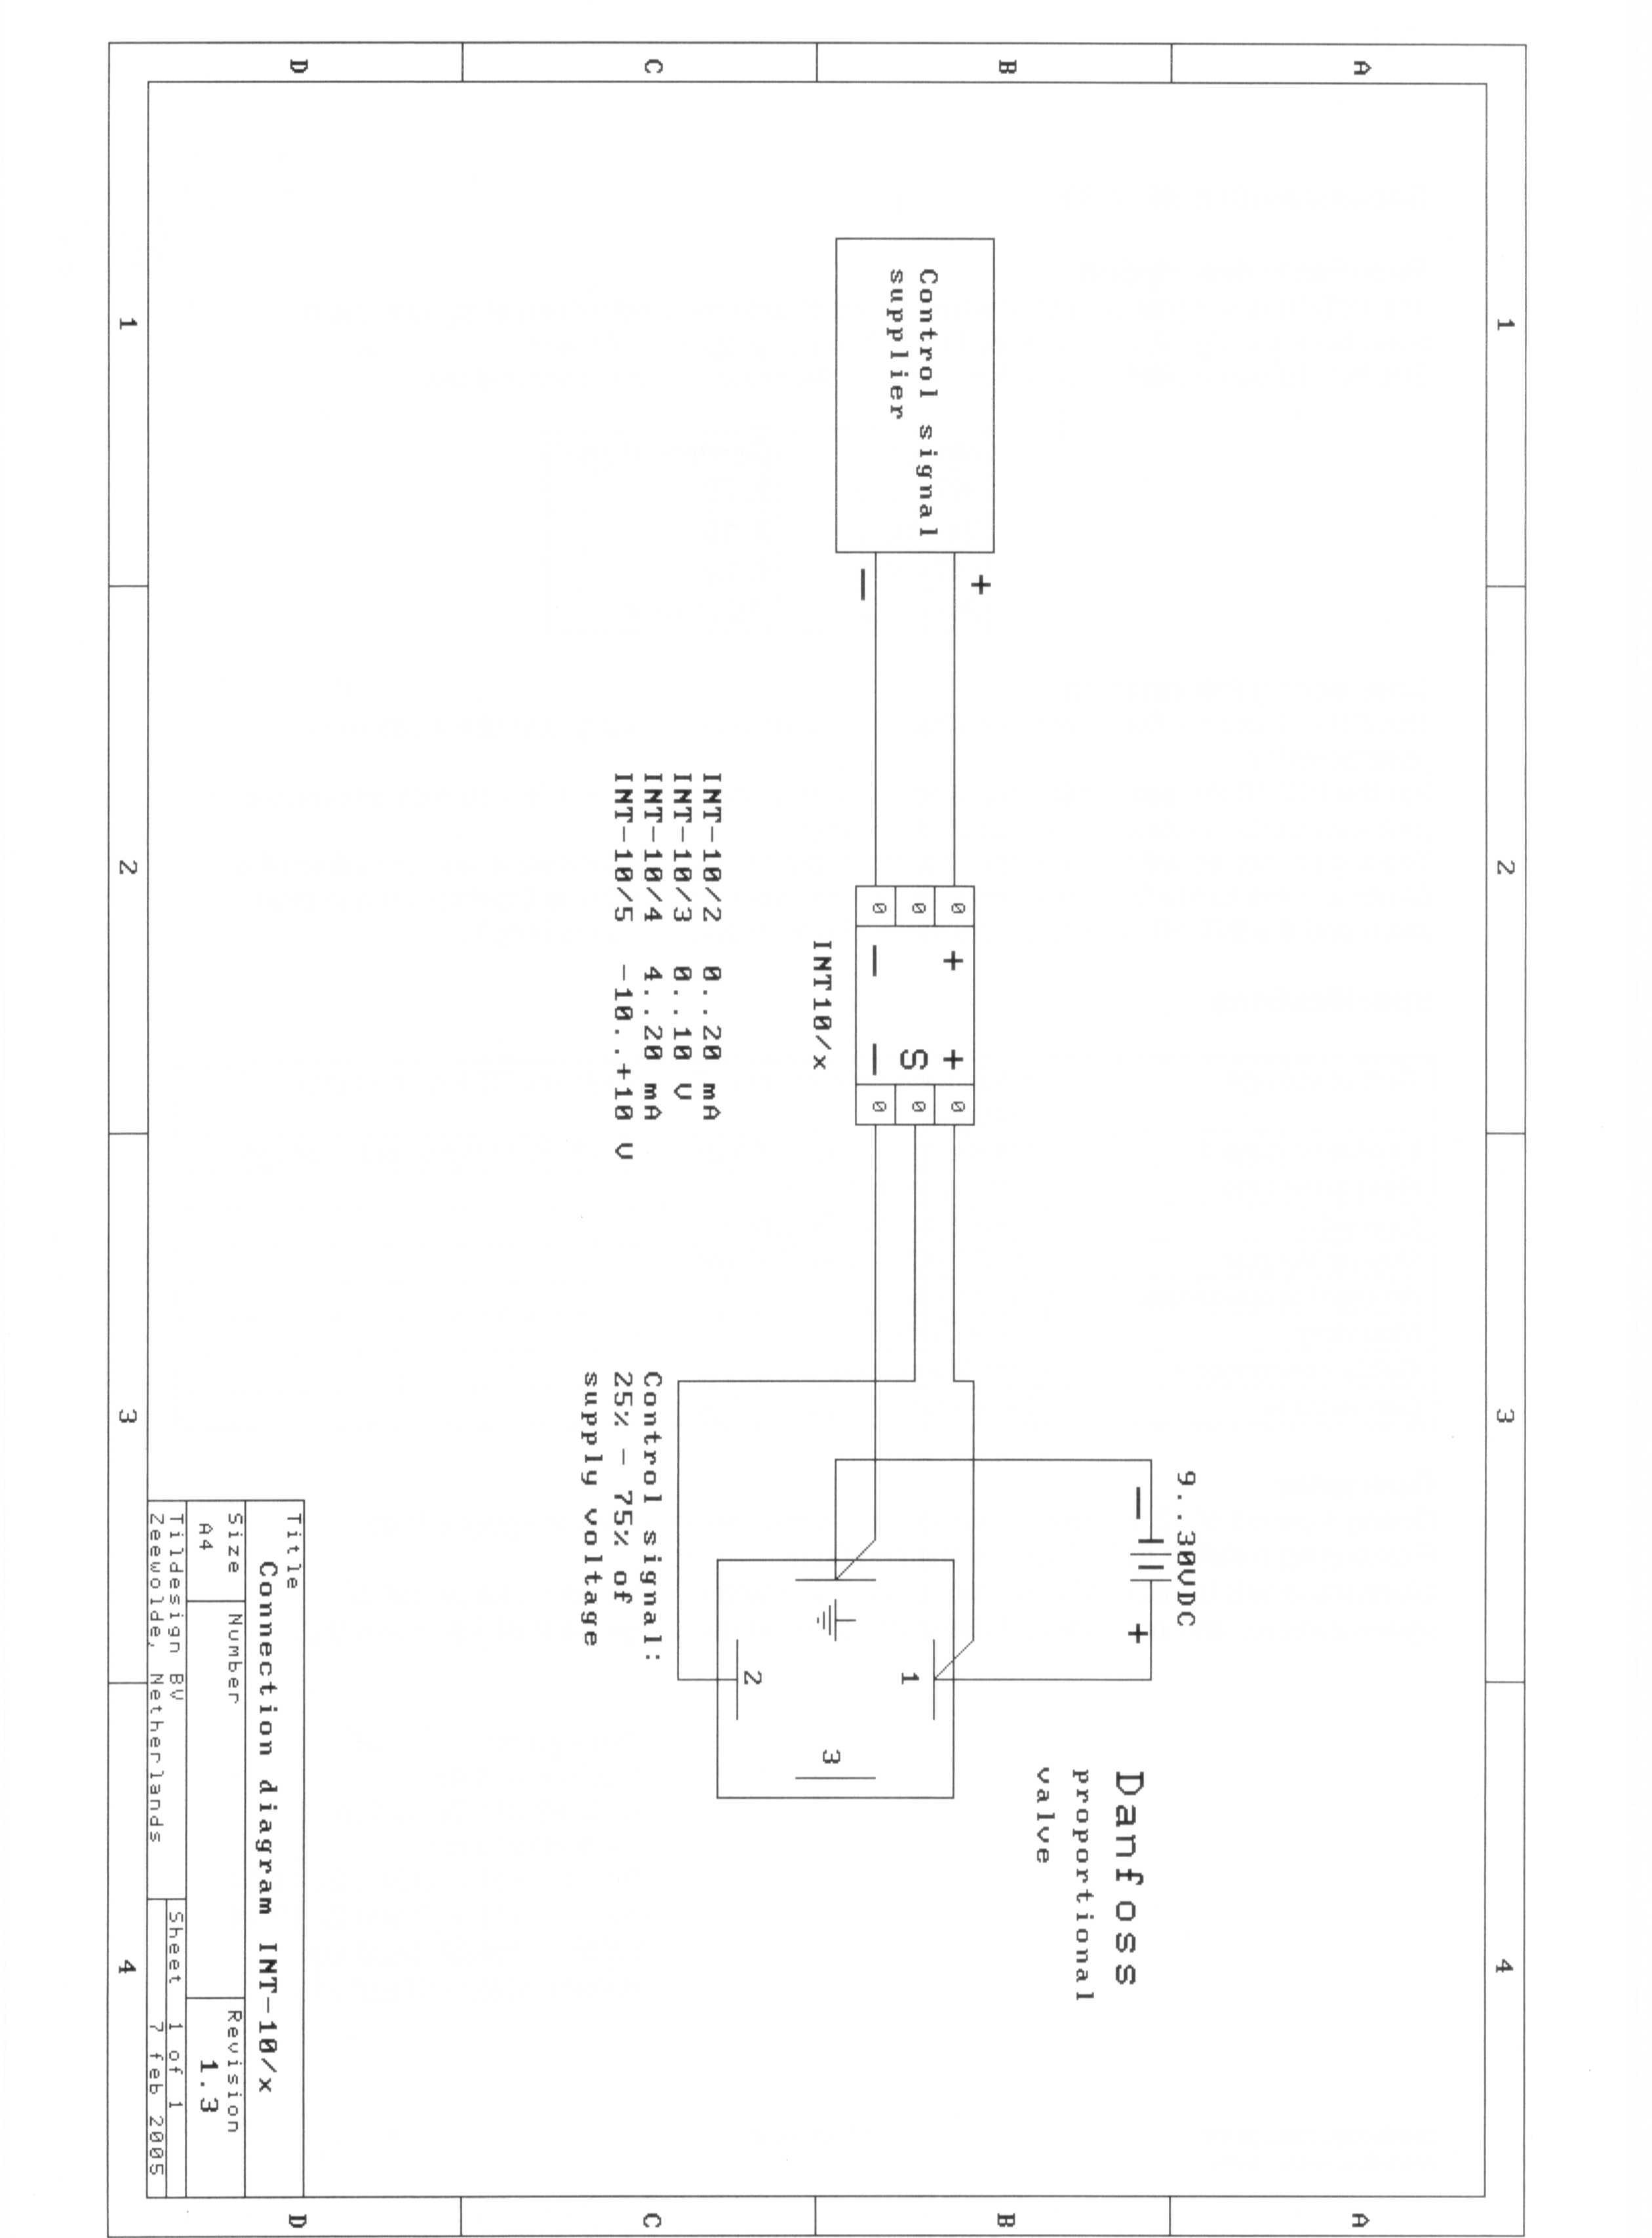 Diagram Kawasaki 750 Xi Wiring Diagram Full Version Hd Quality Wiring Diagram Armordiagramk Urbanamentevitale It